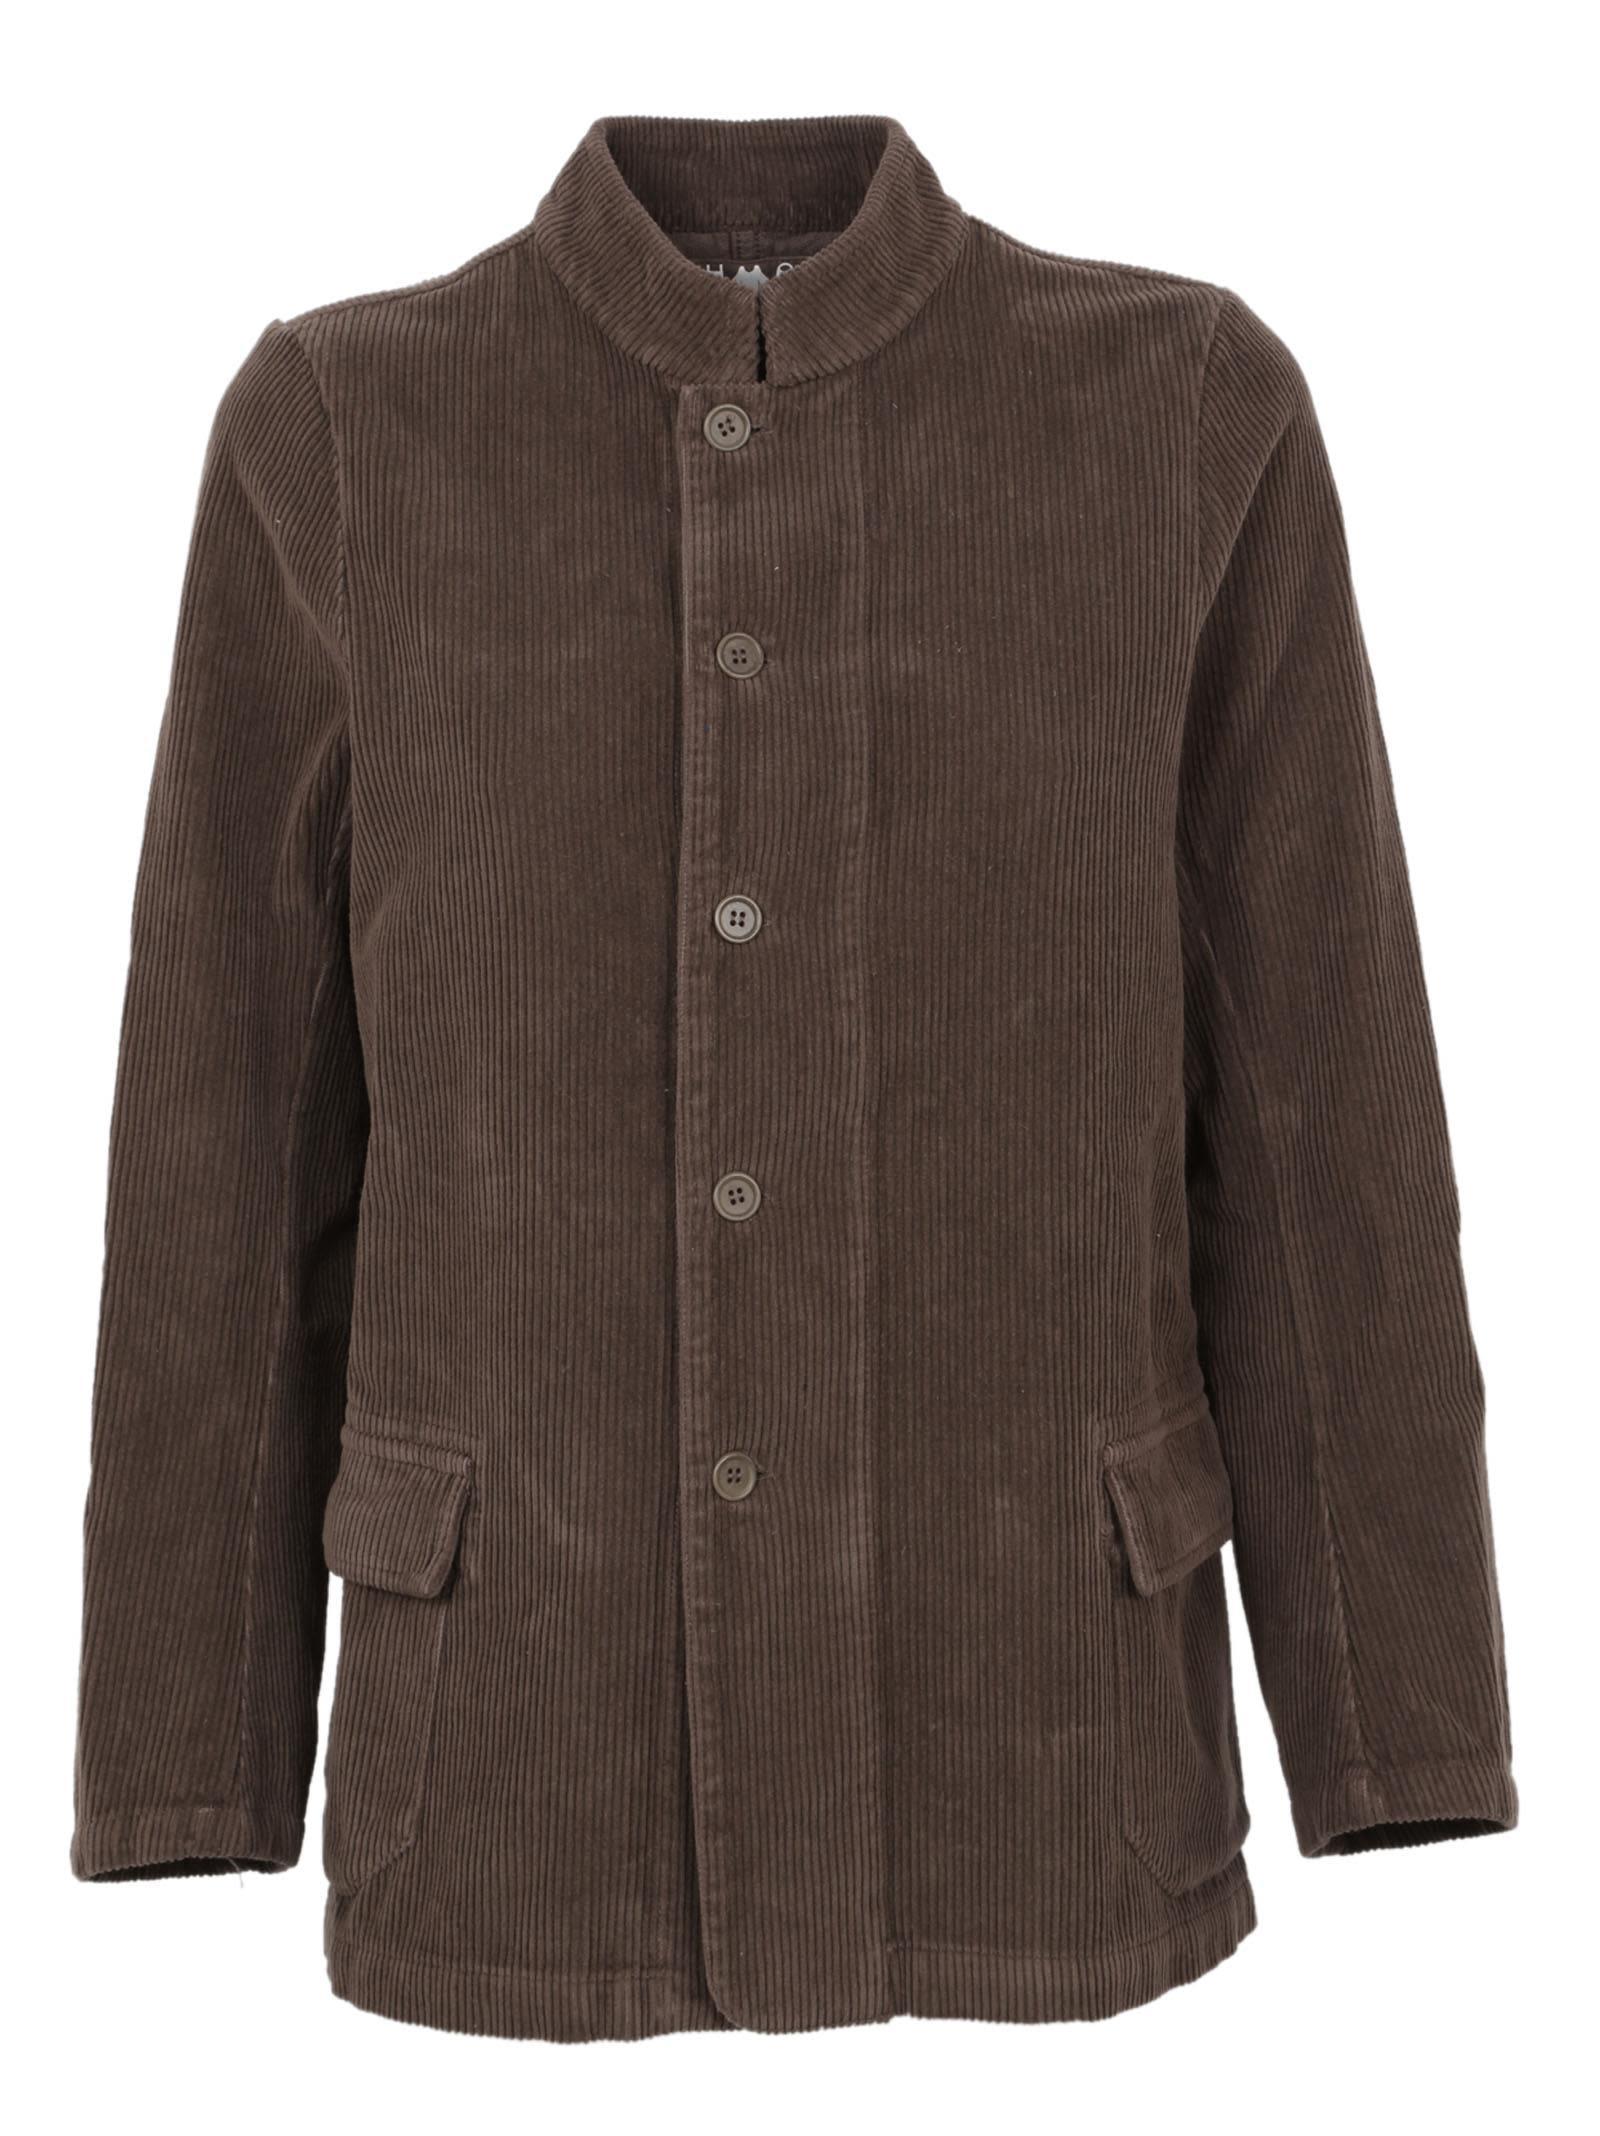 Labo Art Corduroy Jacket